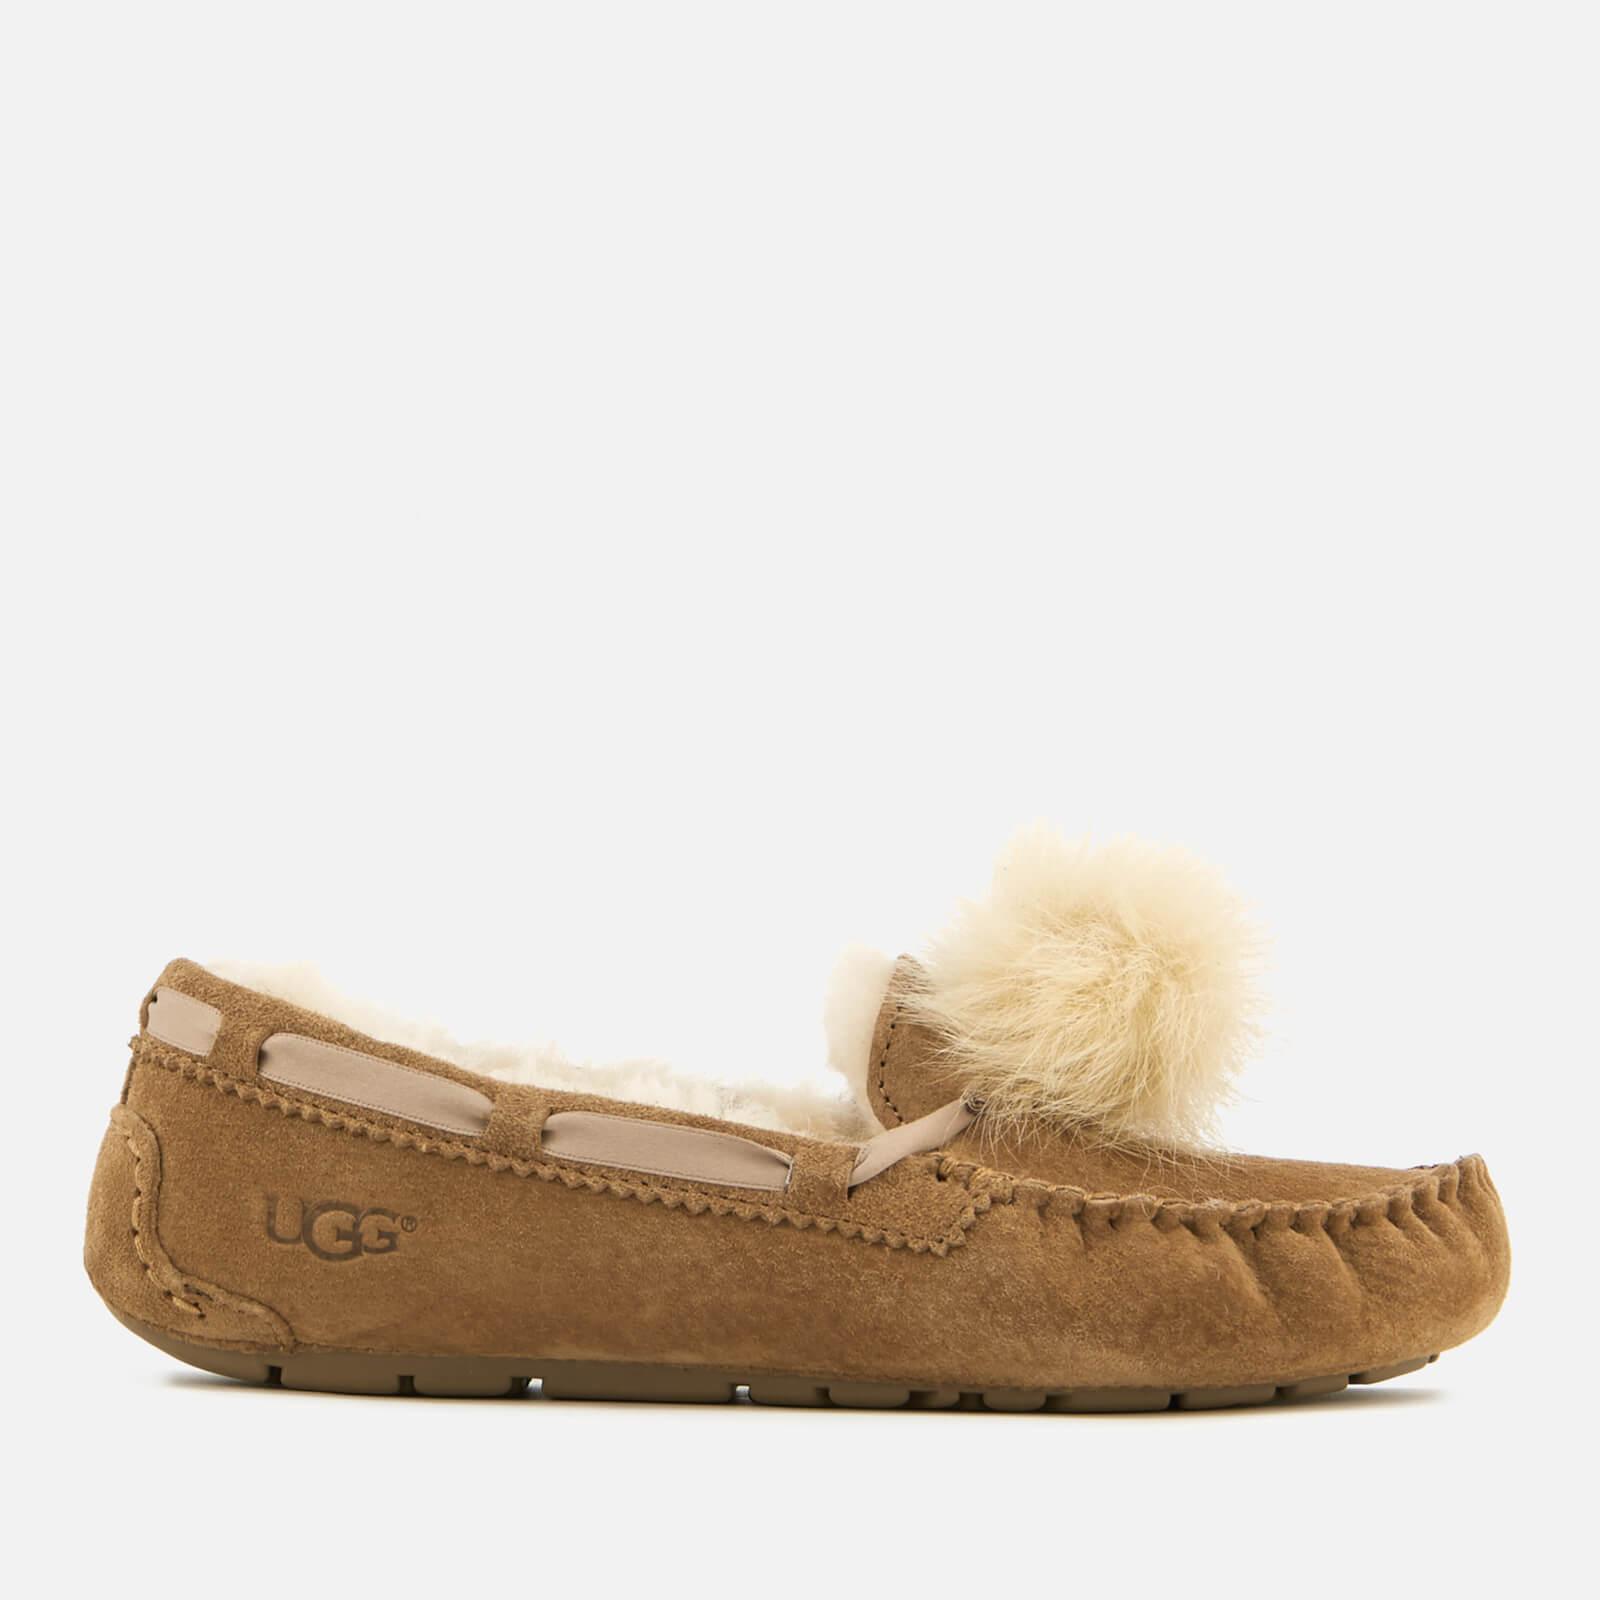 758e719a916 UGG Women's Dakota Moccasin Suede Slippers - Chestnut